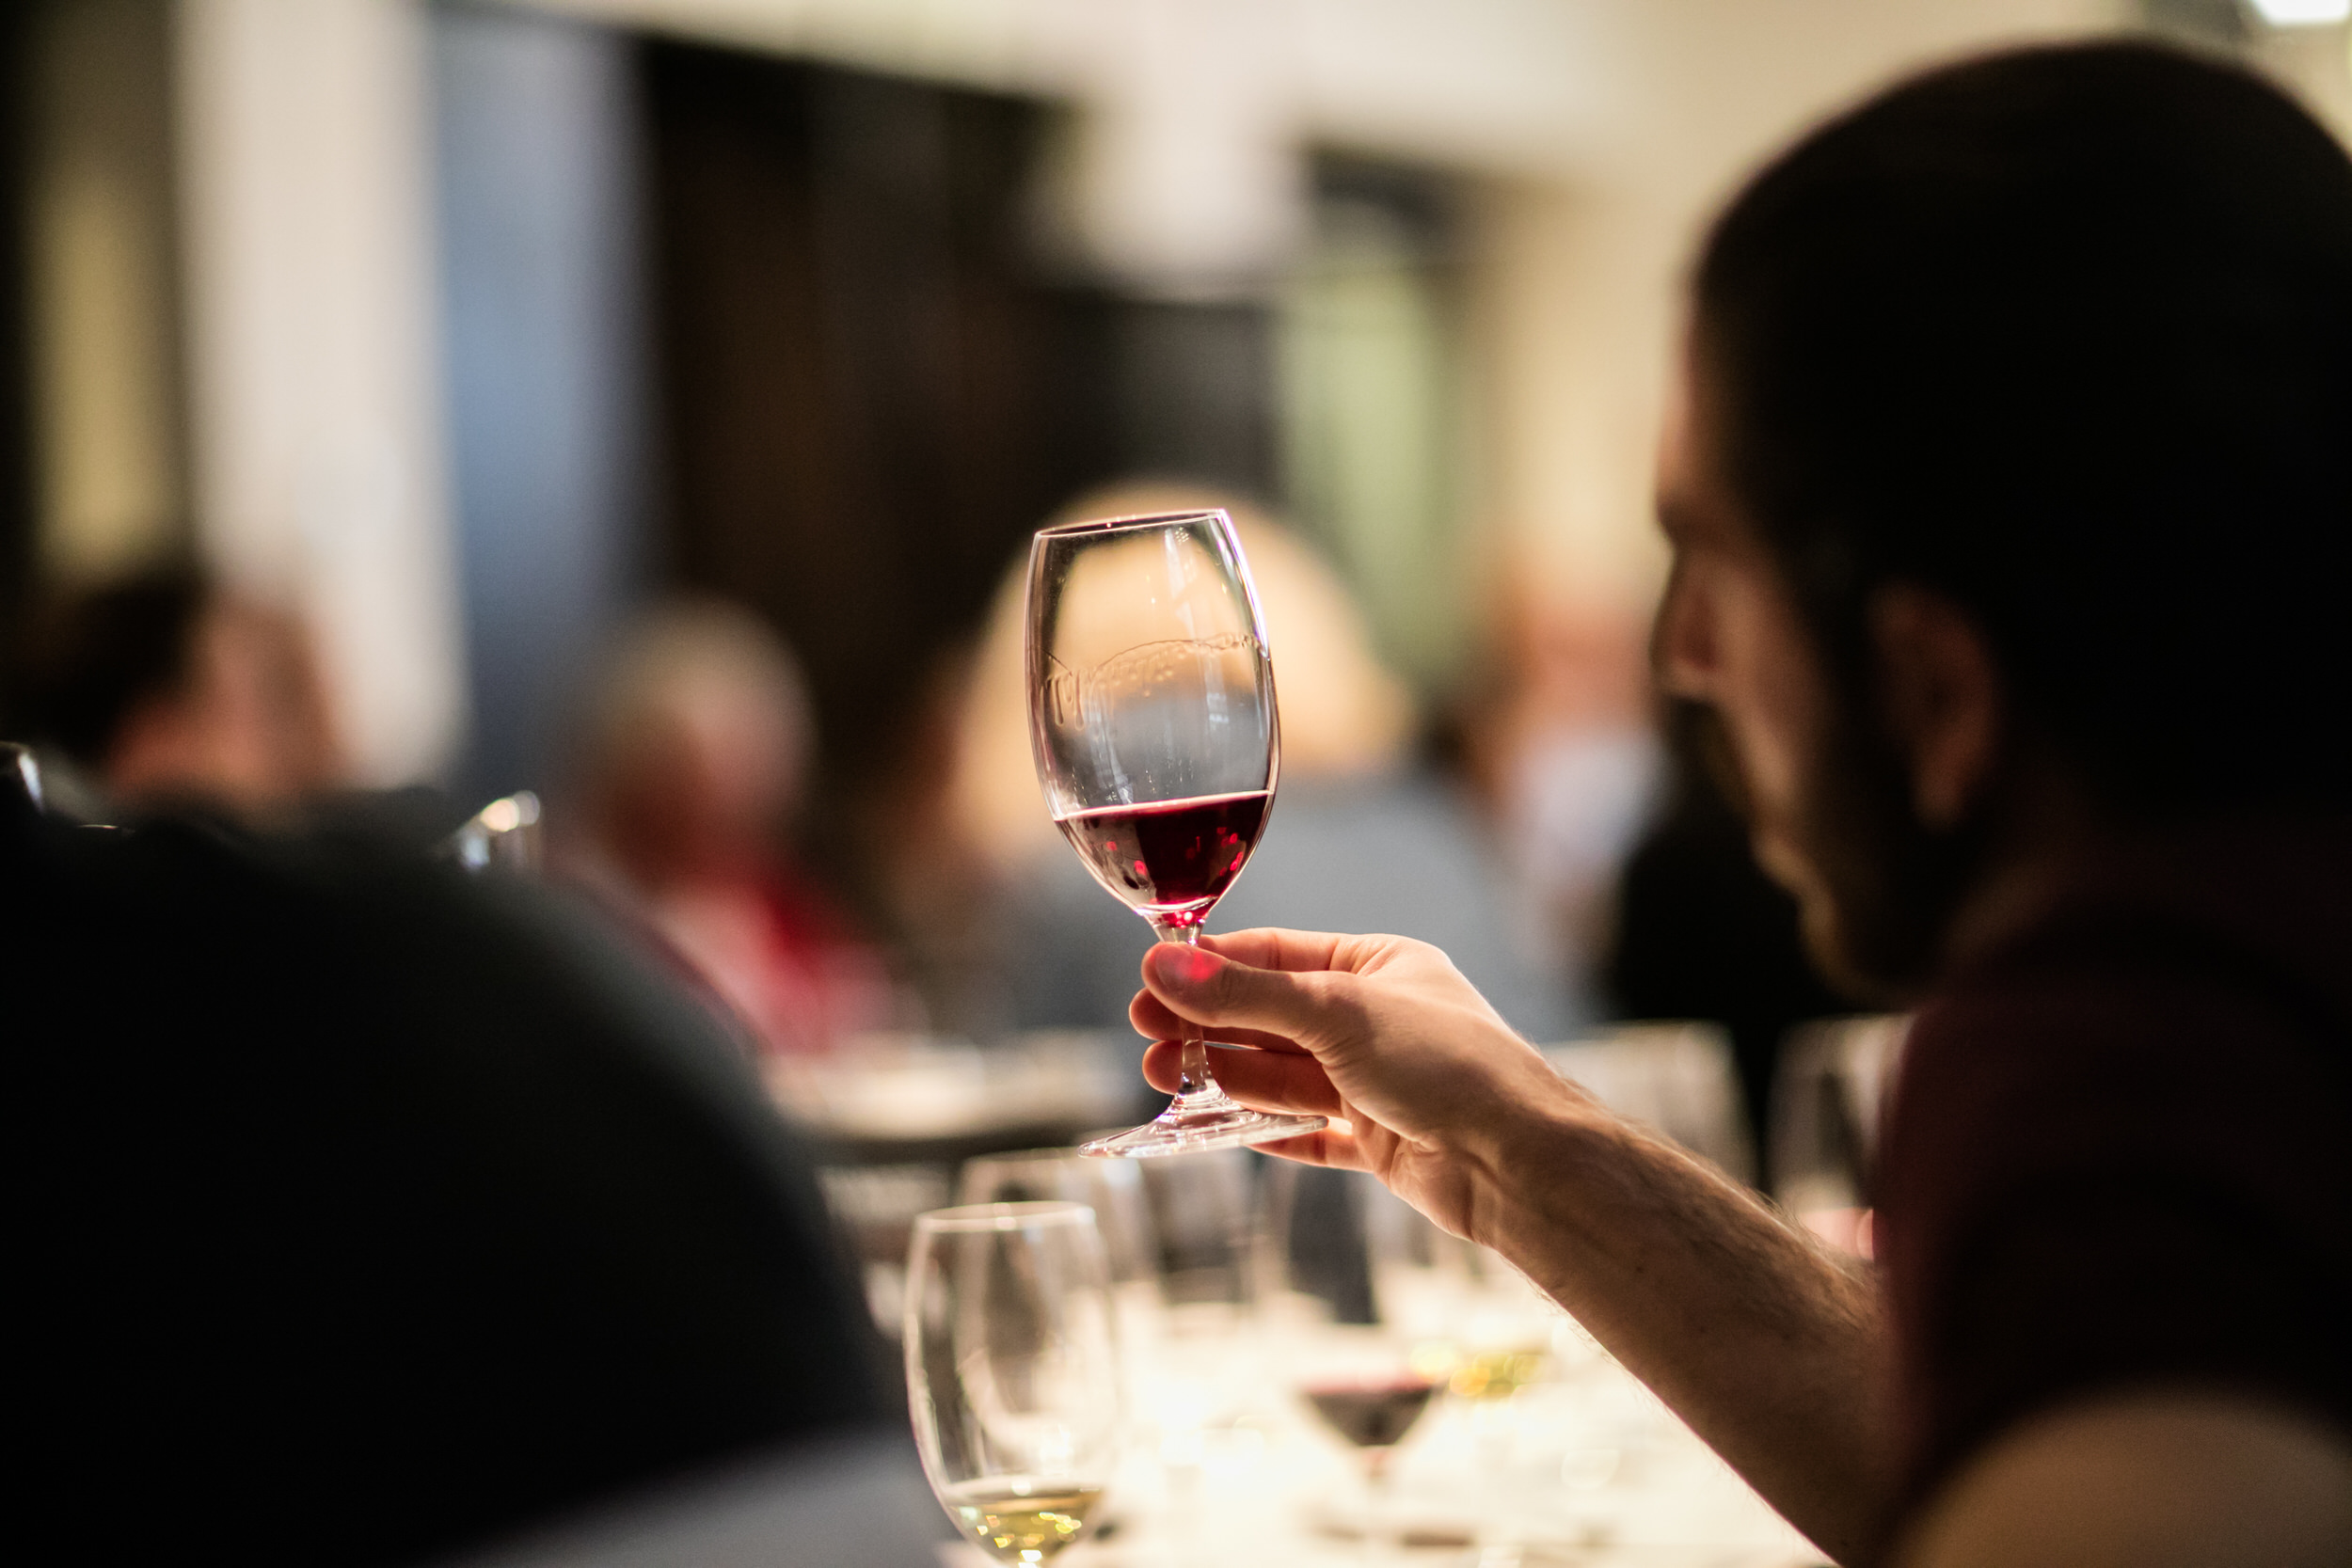 Bespoke wine and food tasting event with Sydney Wine Tasting